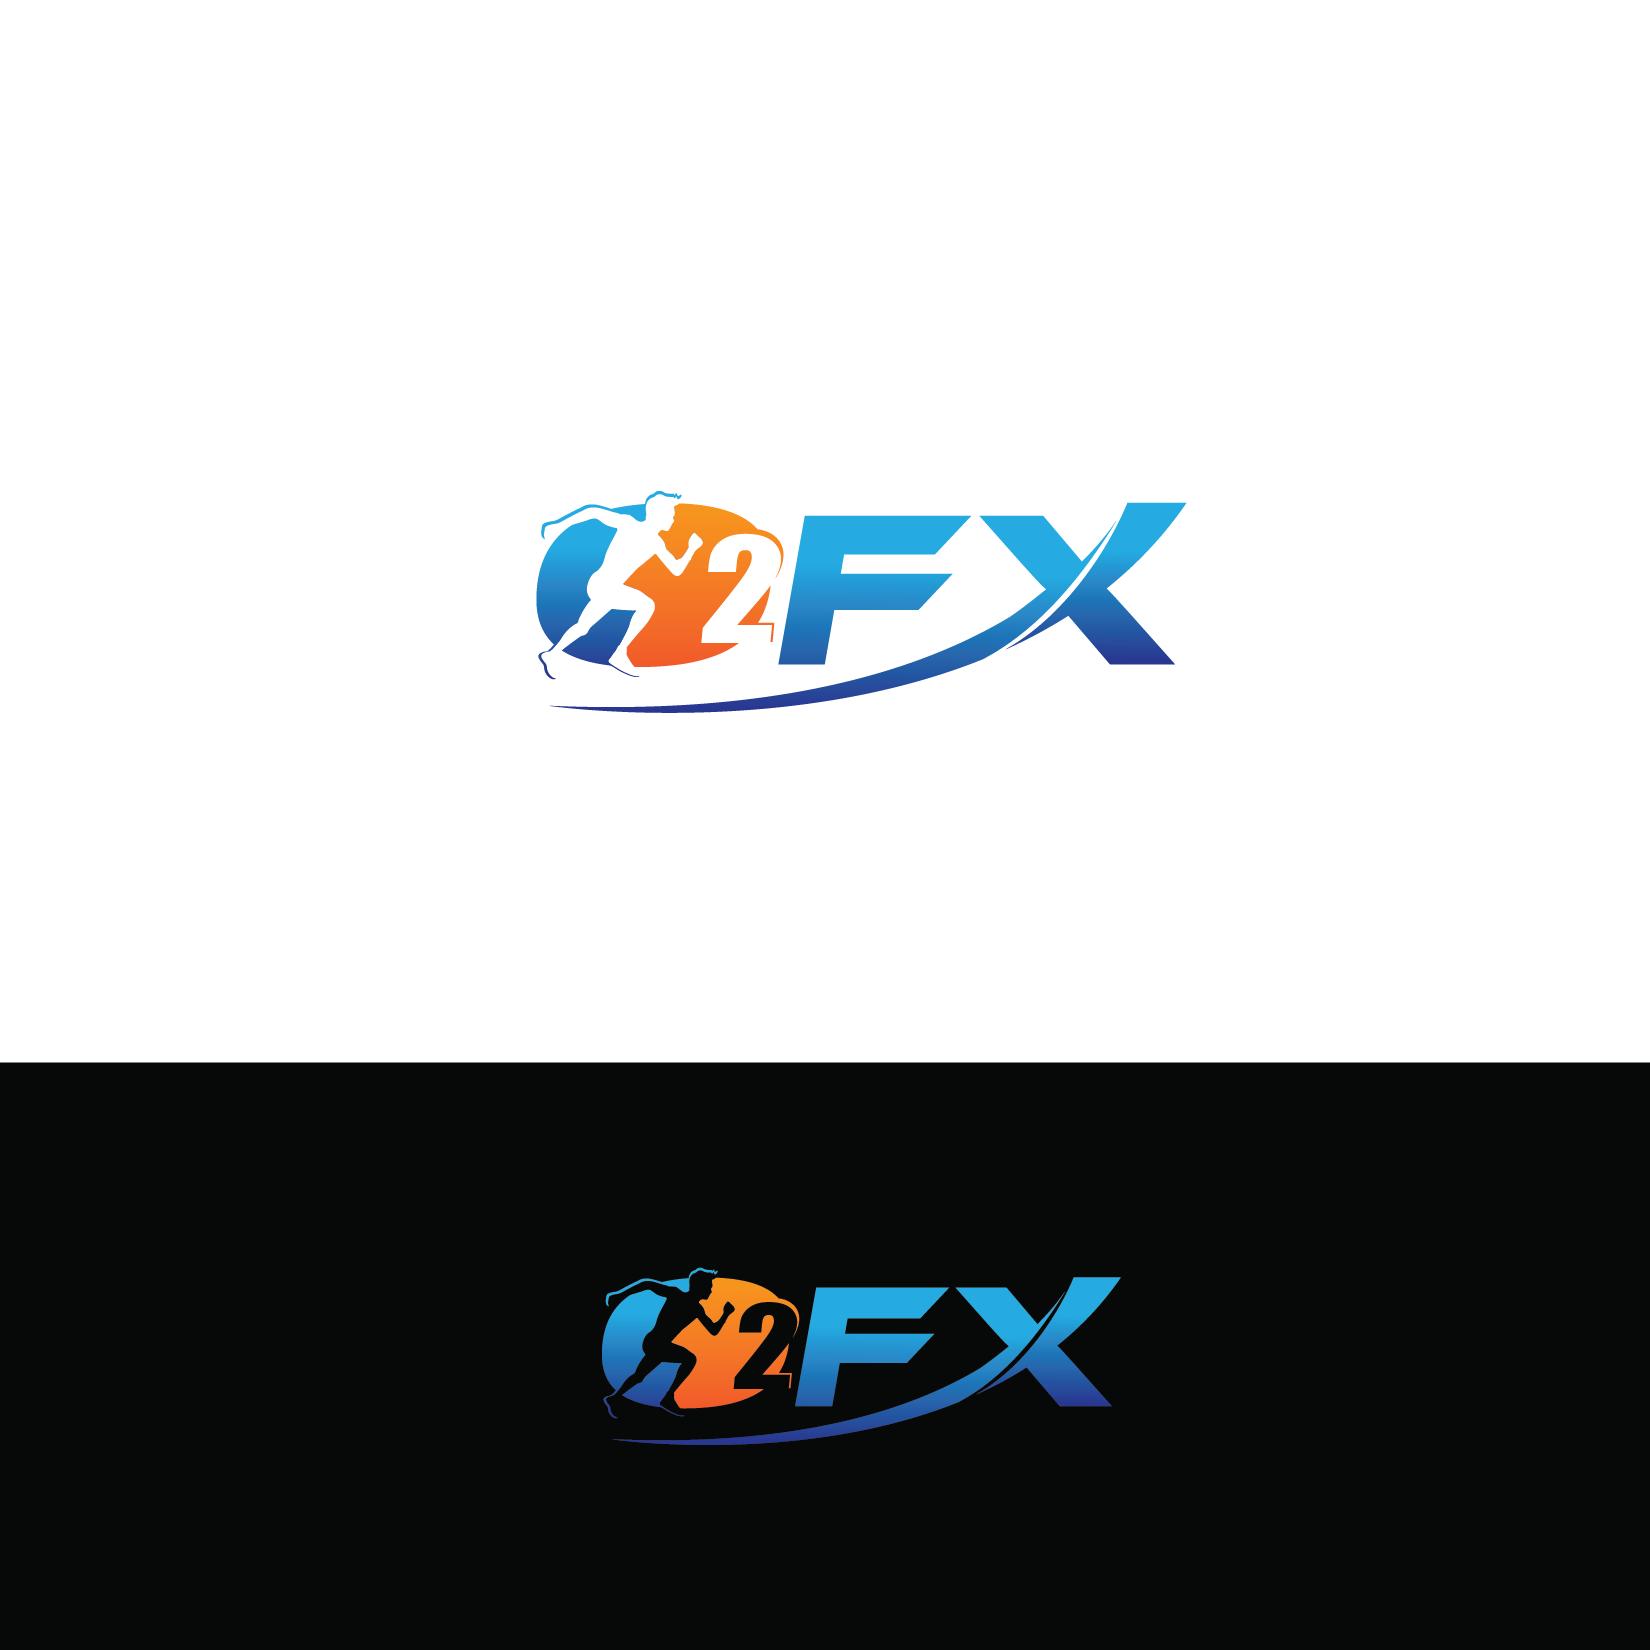 Logo Design by Private User - Entry No. 41 in the Logo Design Contest Captivating Logo Design for O2FX.